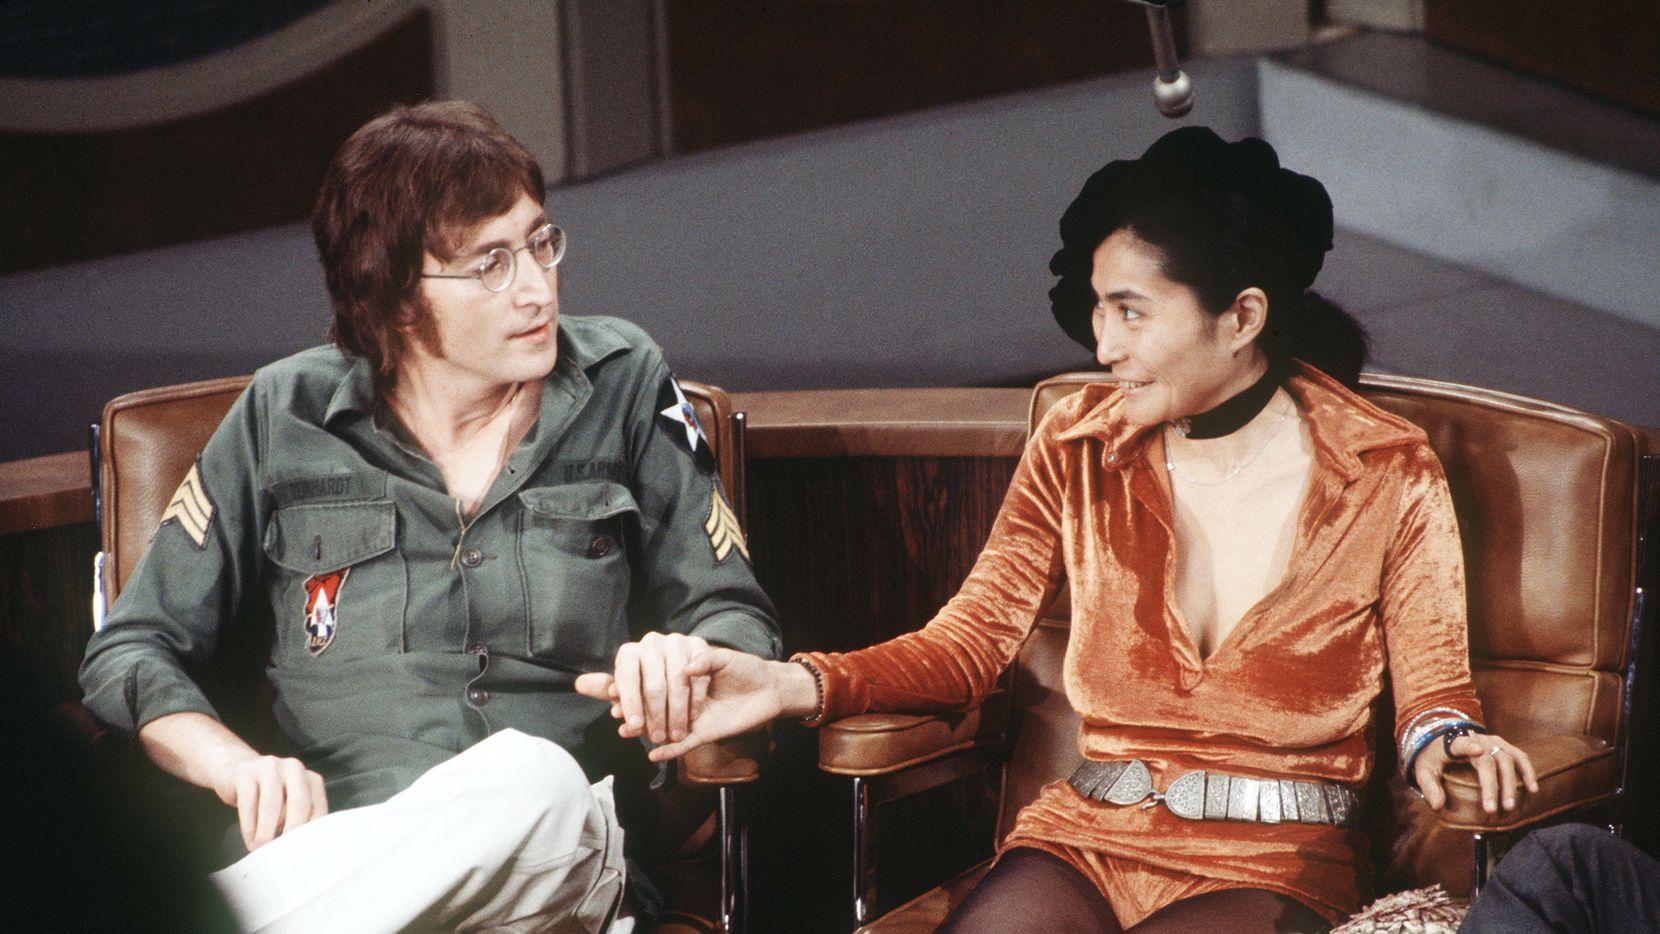 Foto de archivo de 1971 de John Lennon y Yoko en el Dick Cavett Show.